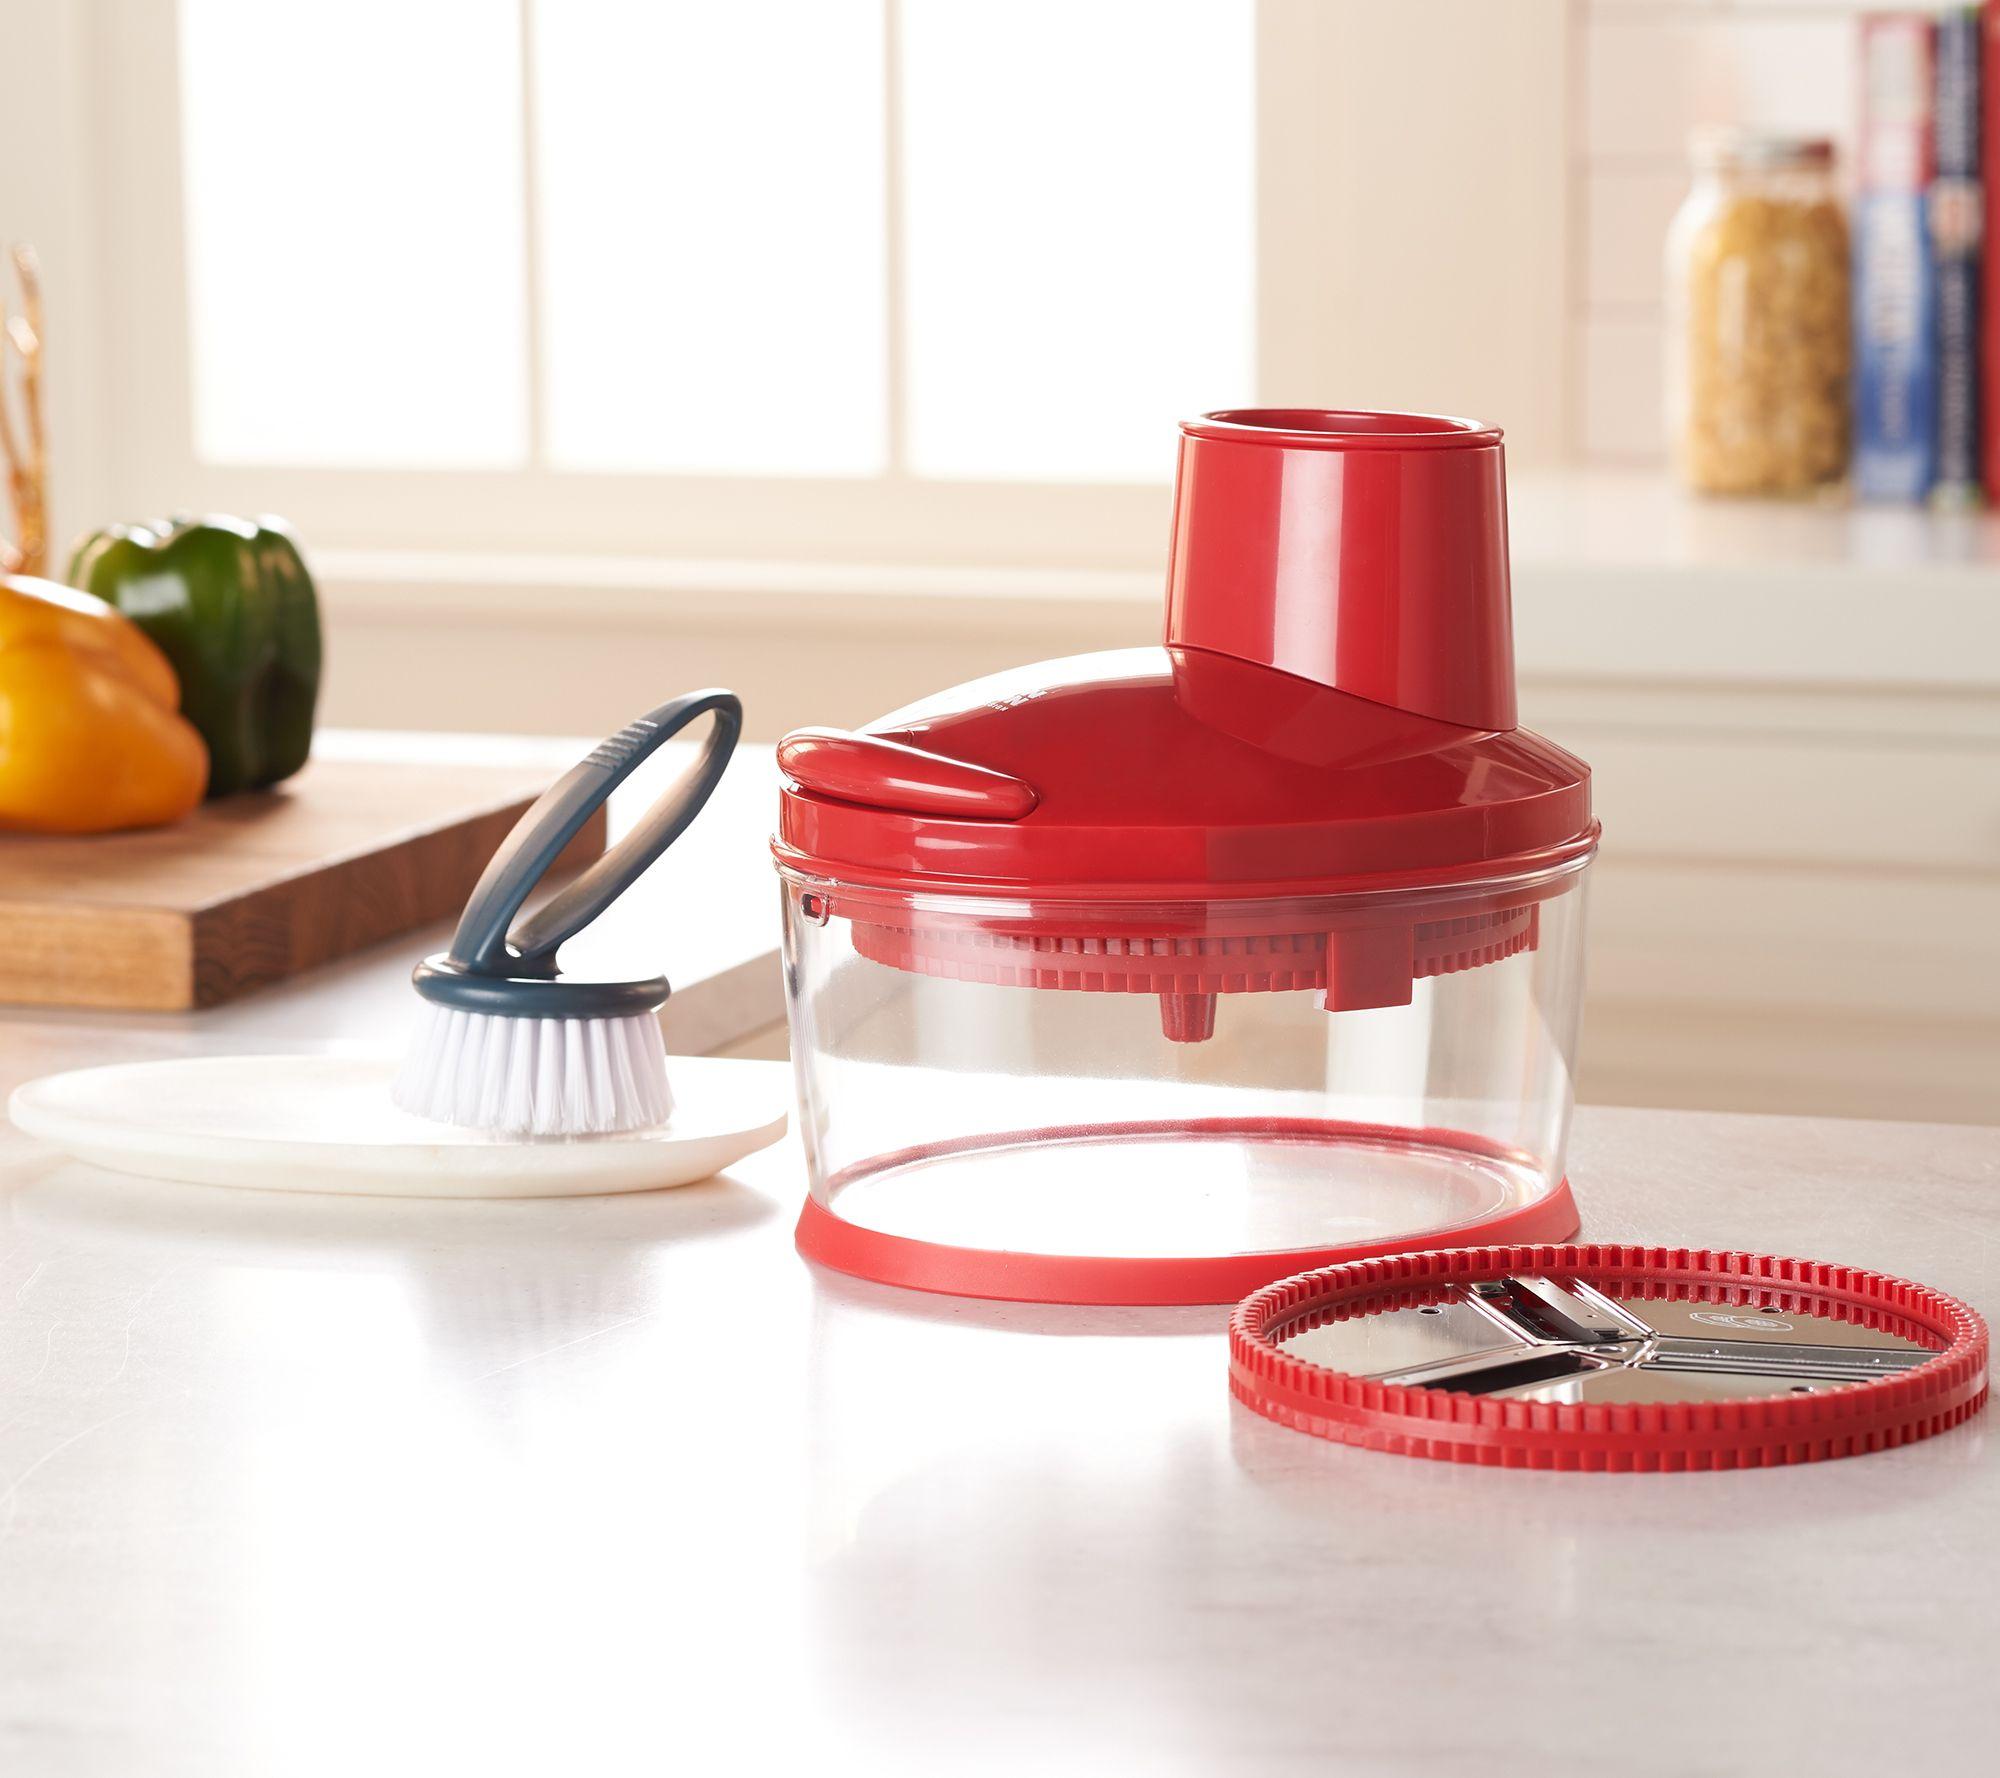 Kuhn-Rikon-4-Cup-Easy-Cut-Food-Slicer-amp-Grater-Model-K46999 thumbnail 8